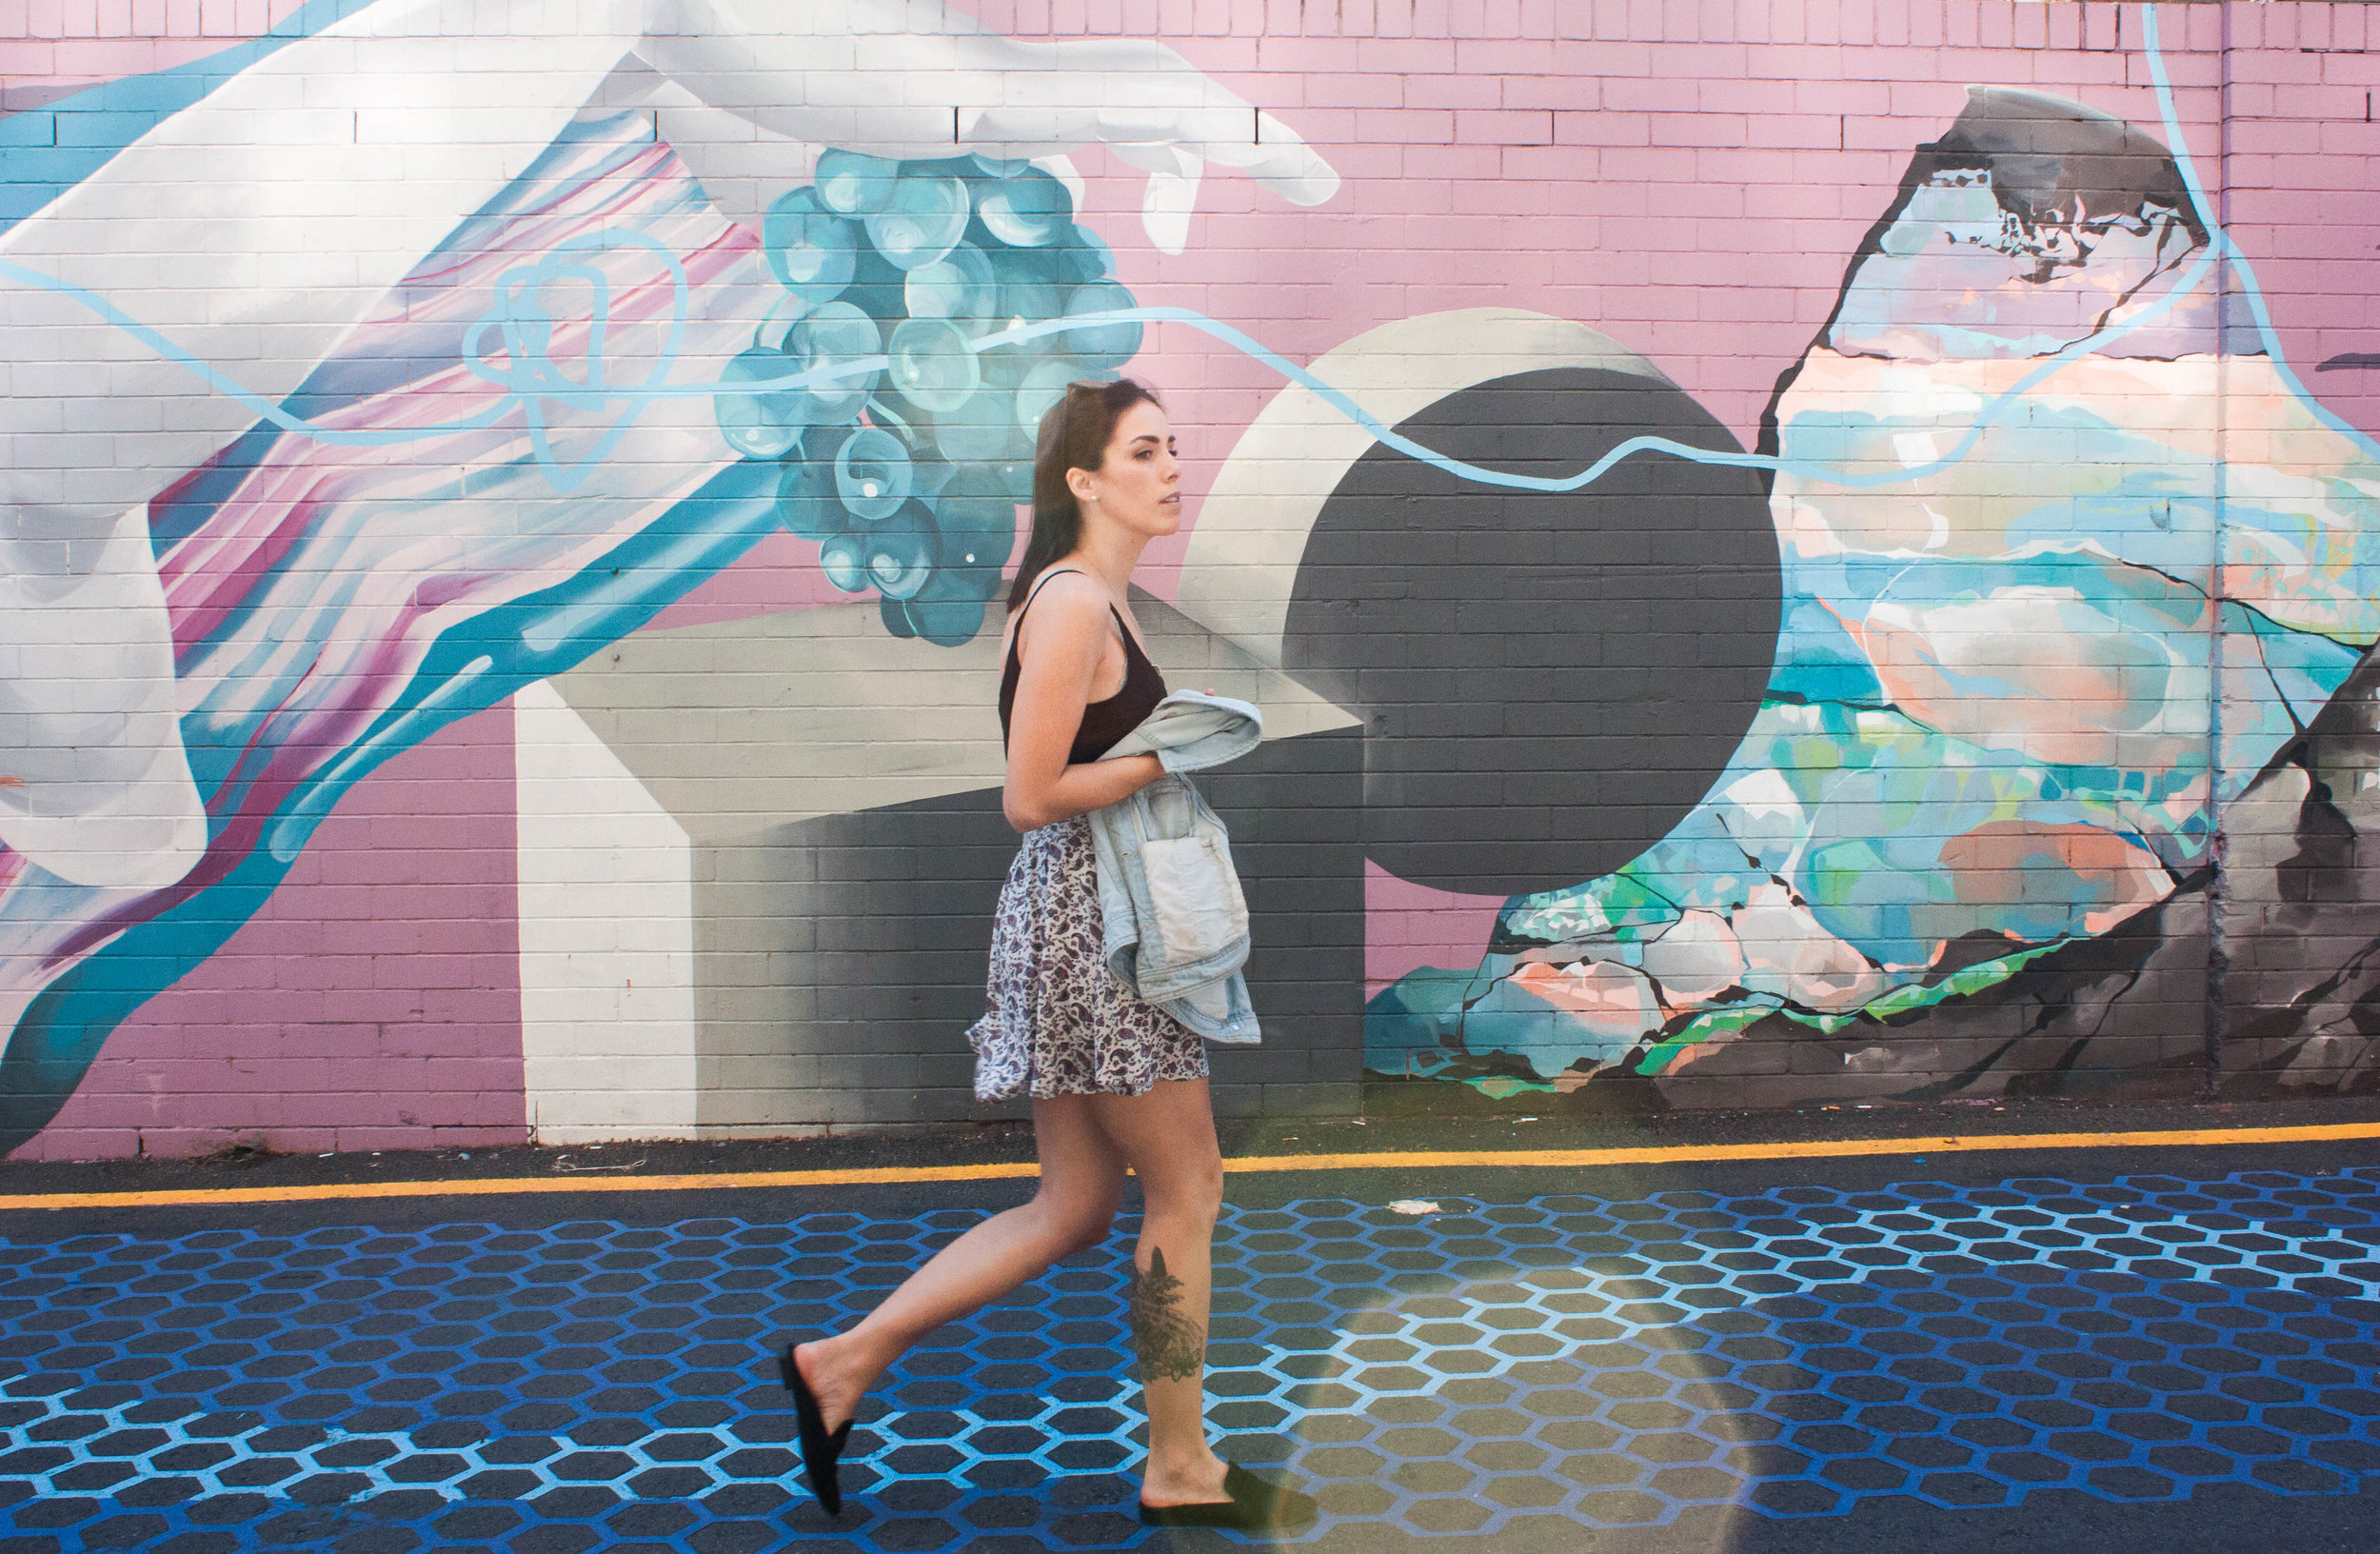 Katy Brisbane - We Are Kitty Gang